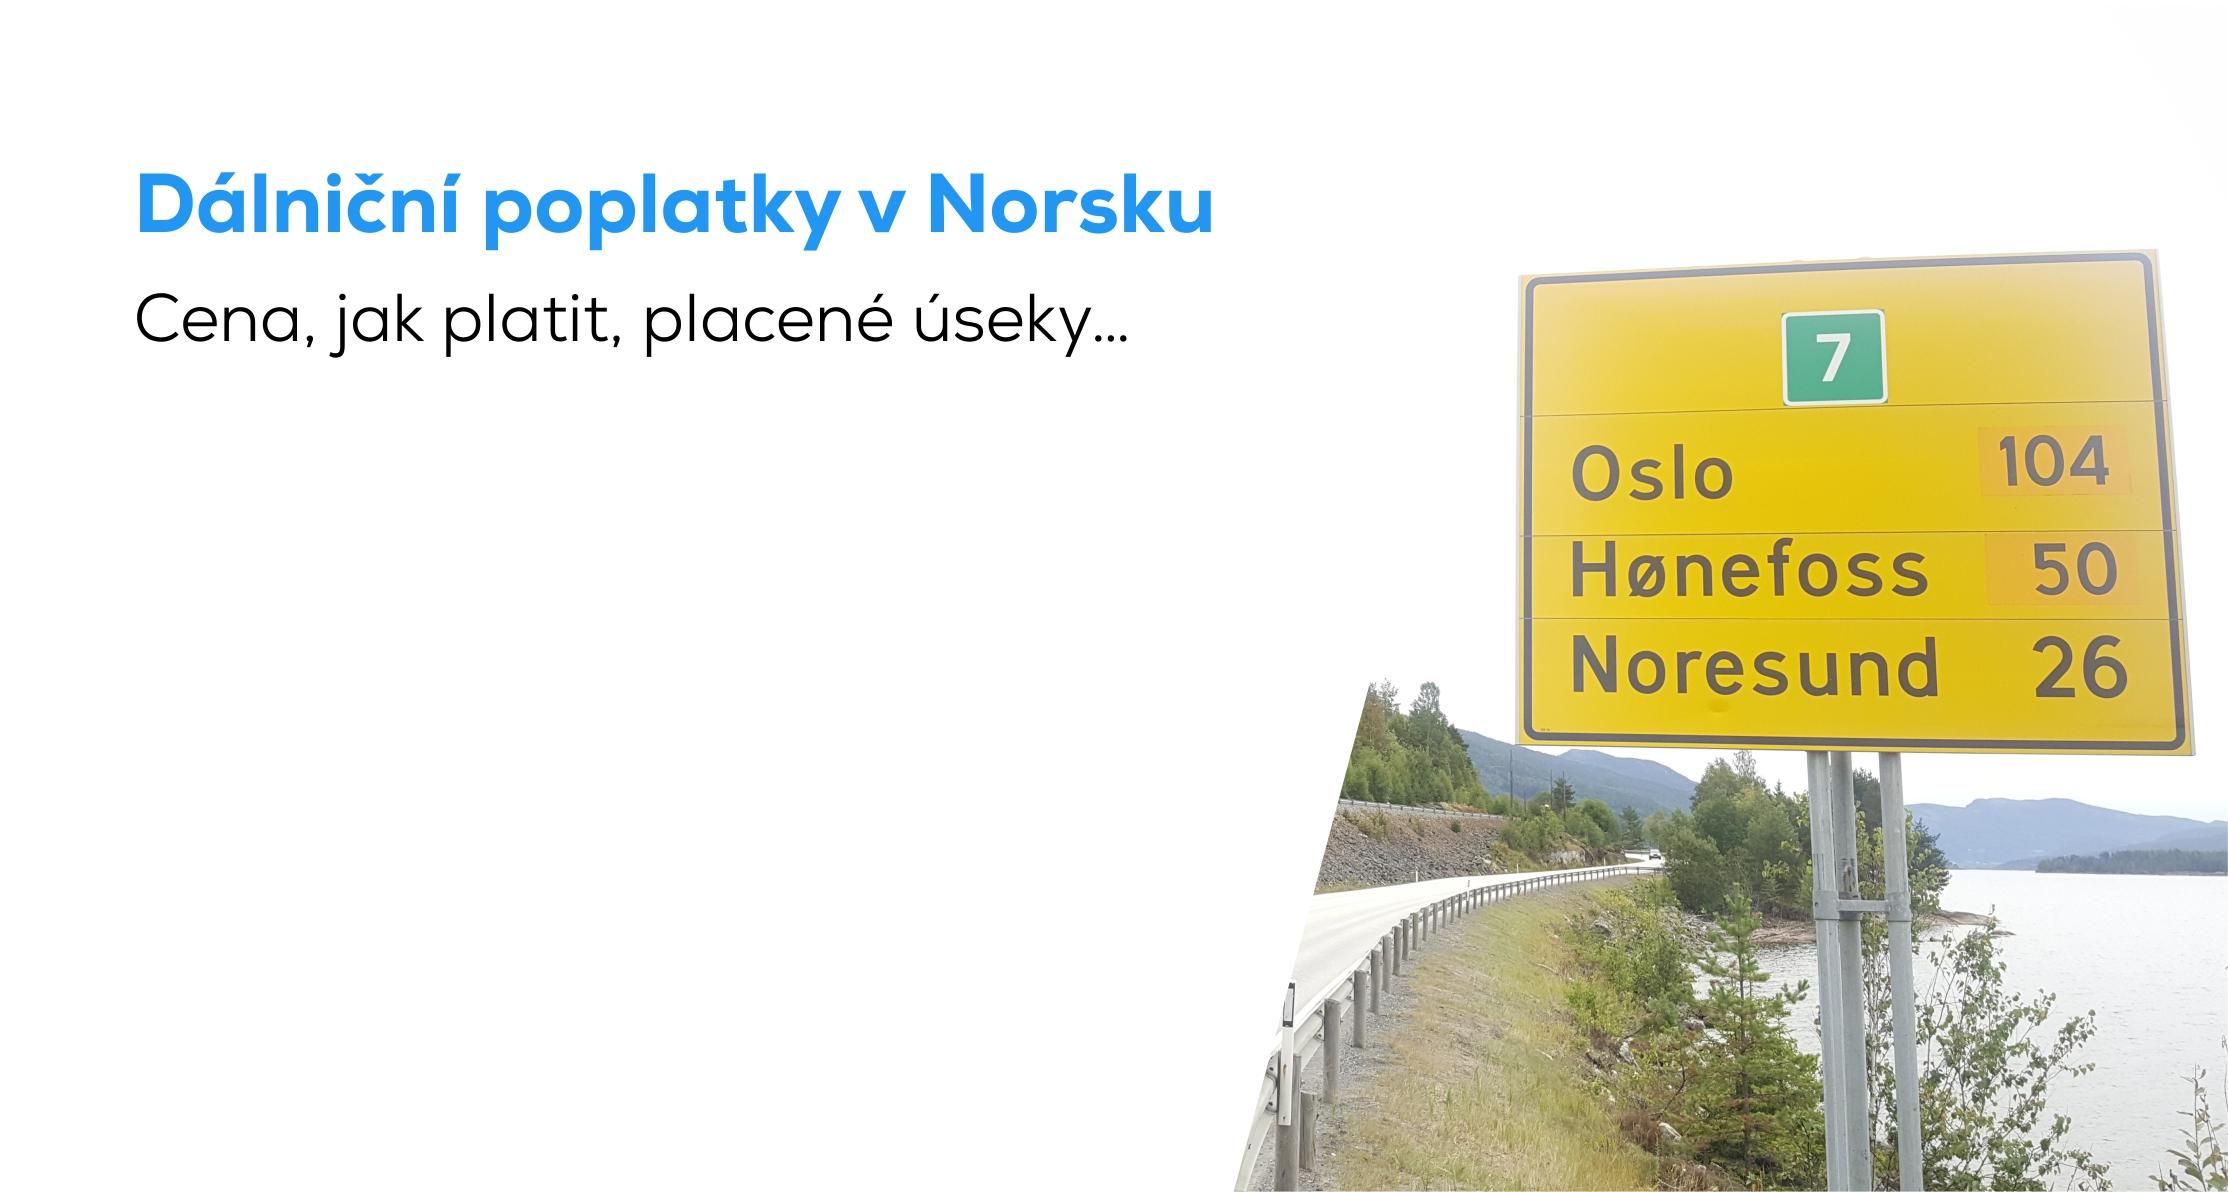 Dalnicni Poplatky Norsko 2020 Cena Jak Platit Placene Useky